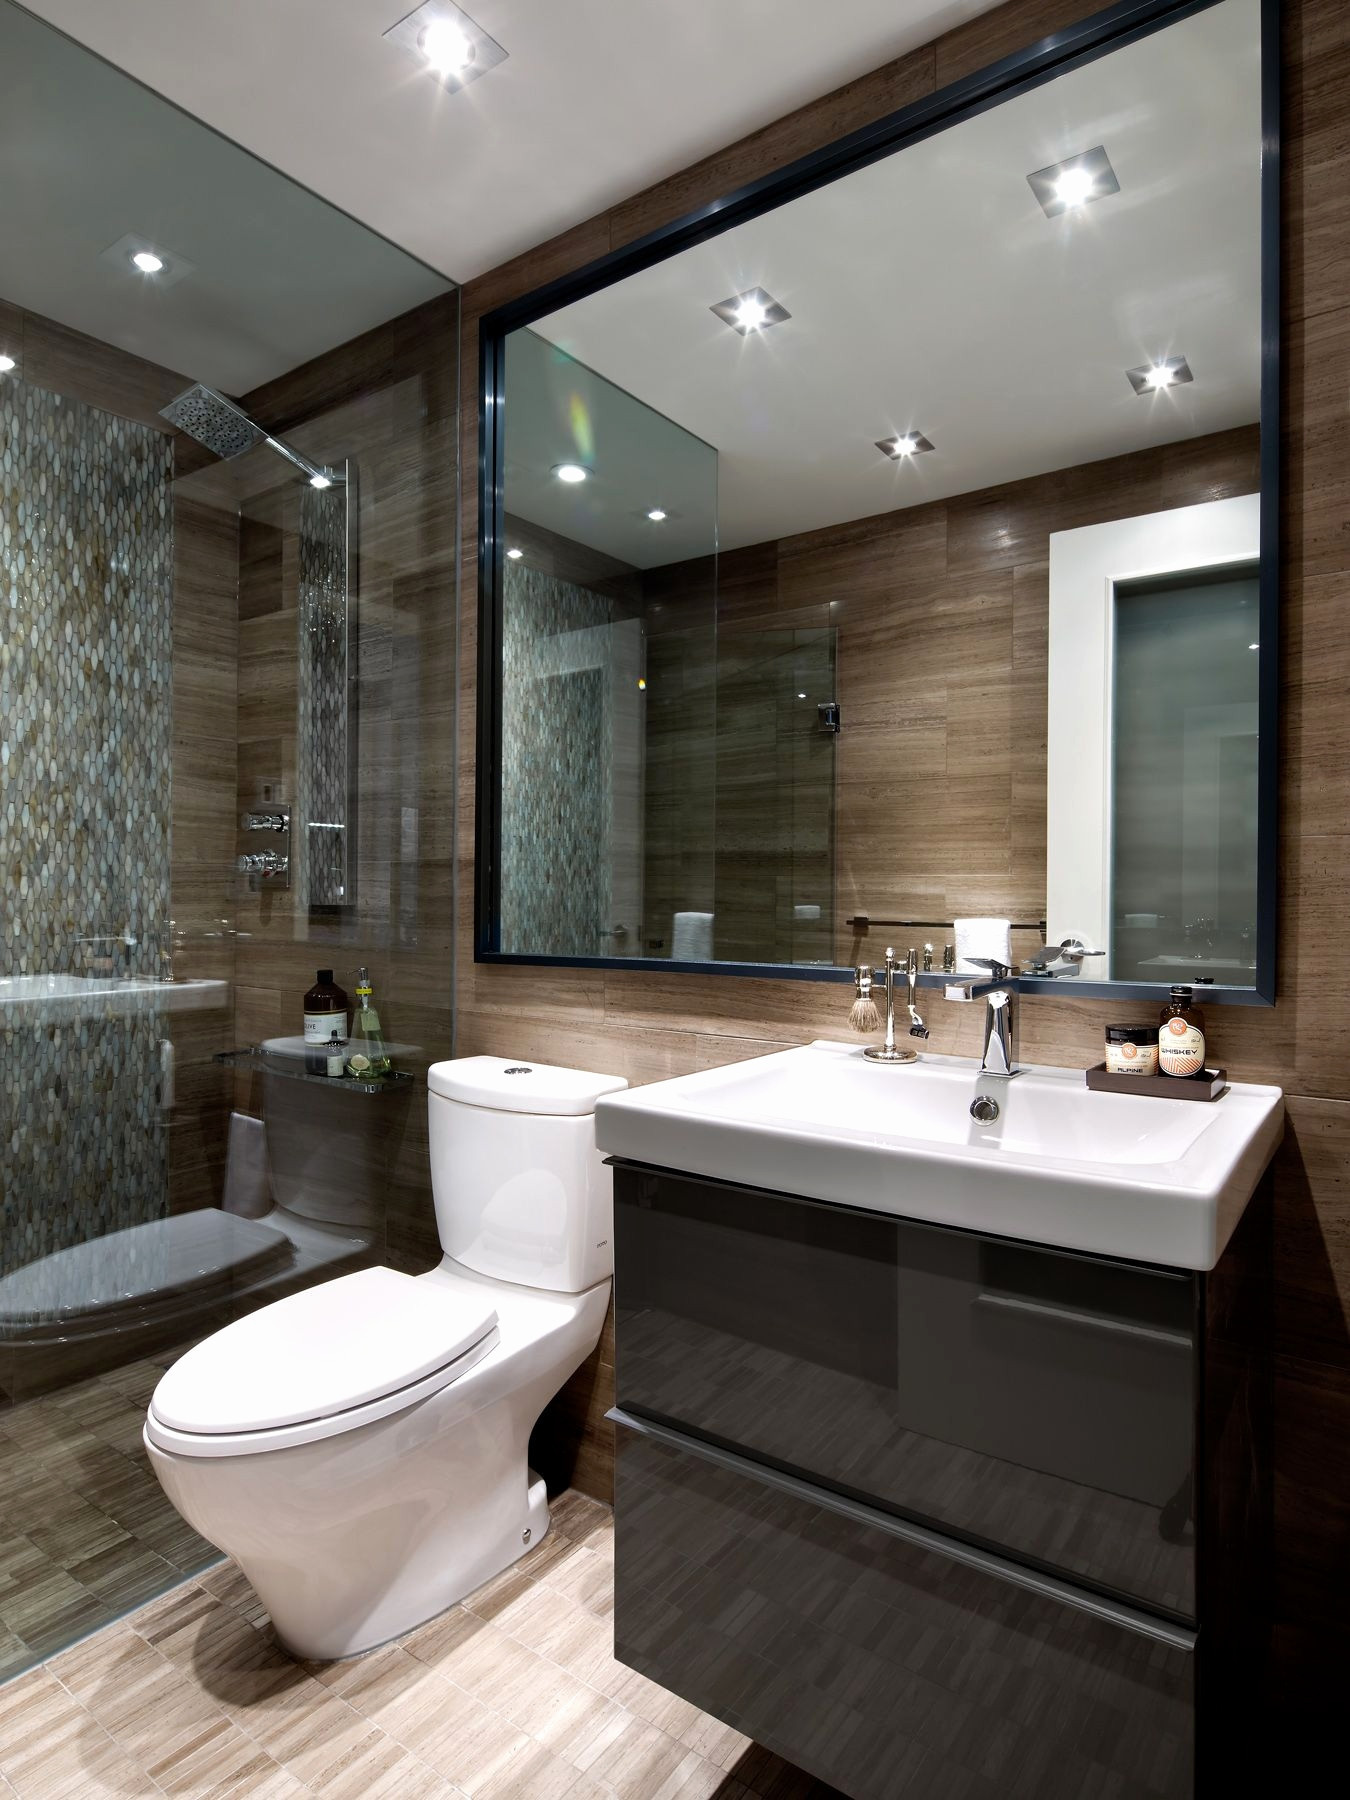 Design gallery cosmosindesign com. Bathroom clipart modern bathroom